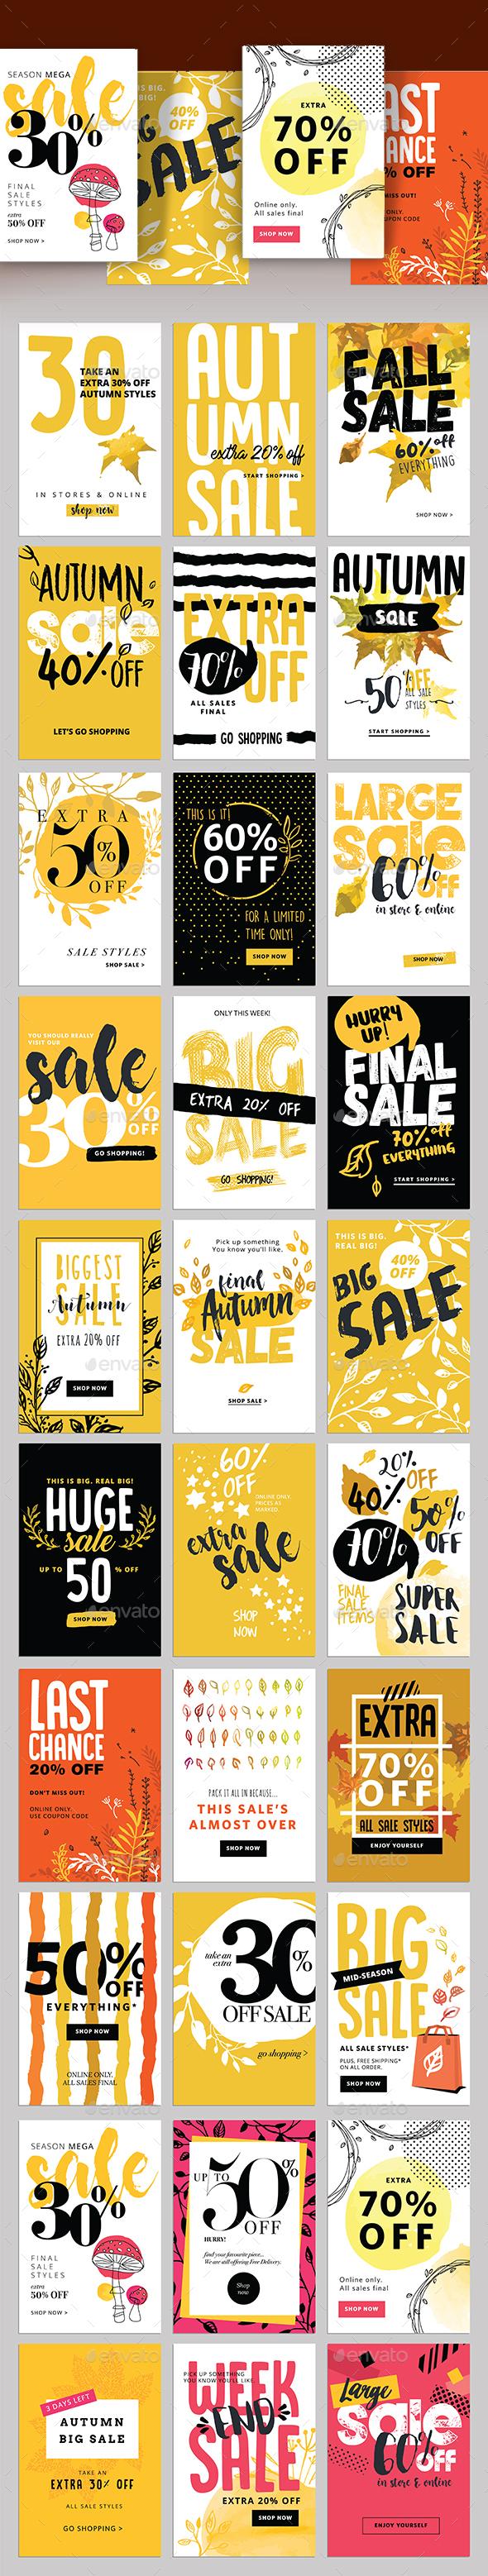 Autumn Social Media Sale Banners - Banners & Ads Web Elements